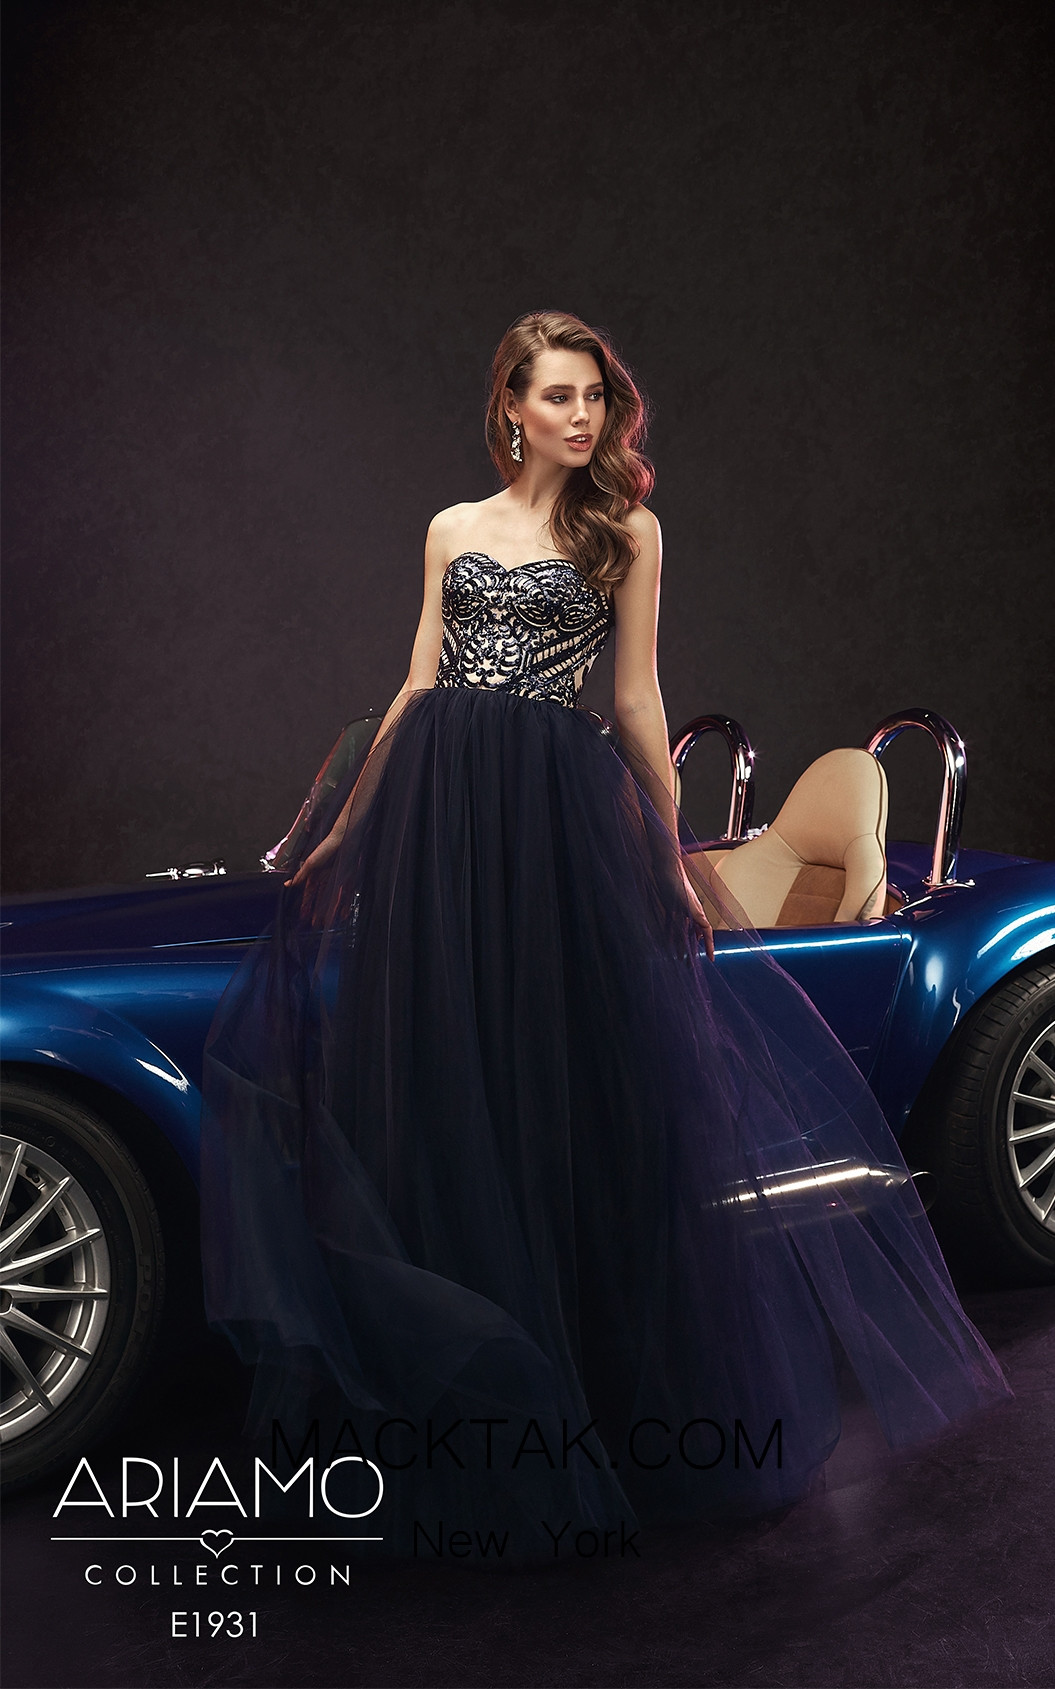 Ariamo E1931 Front Dress